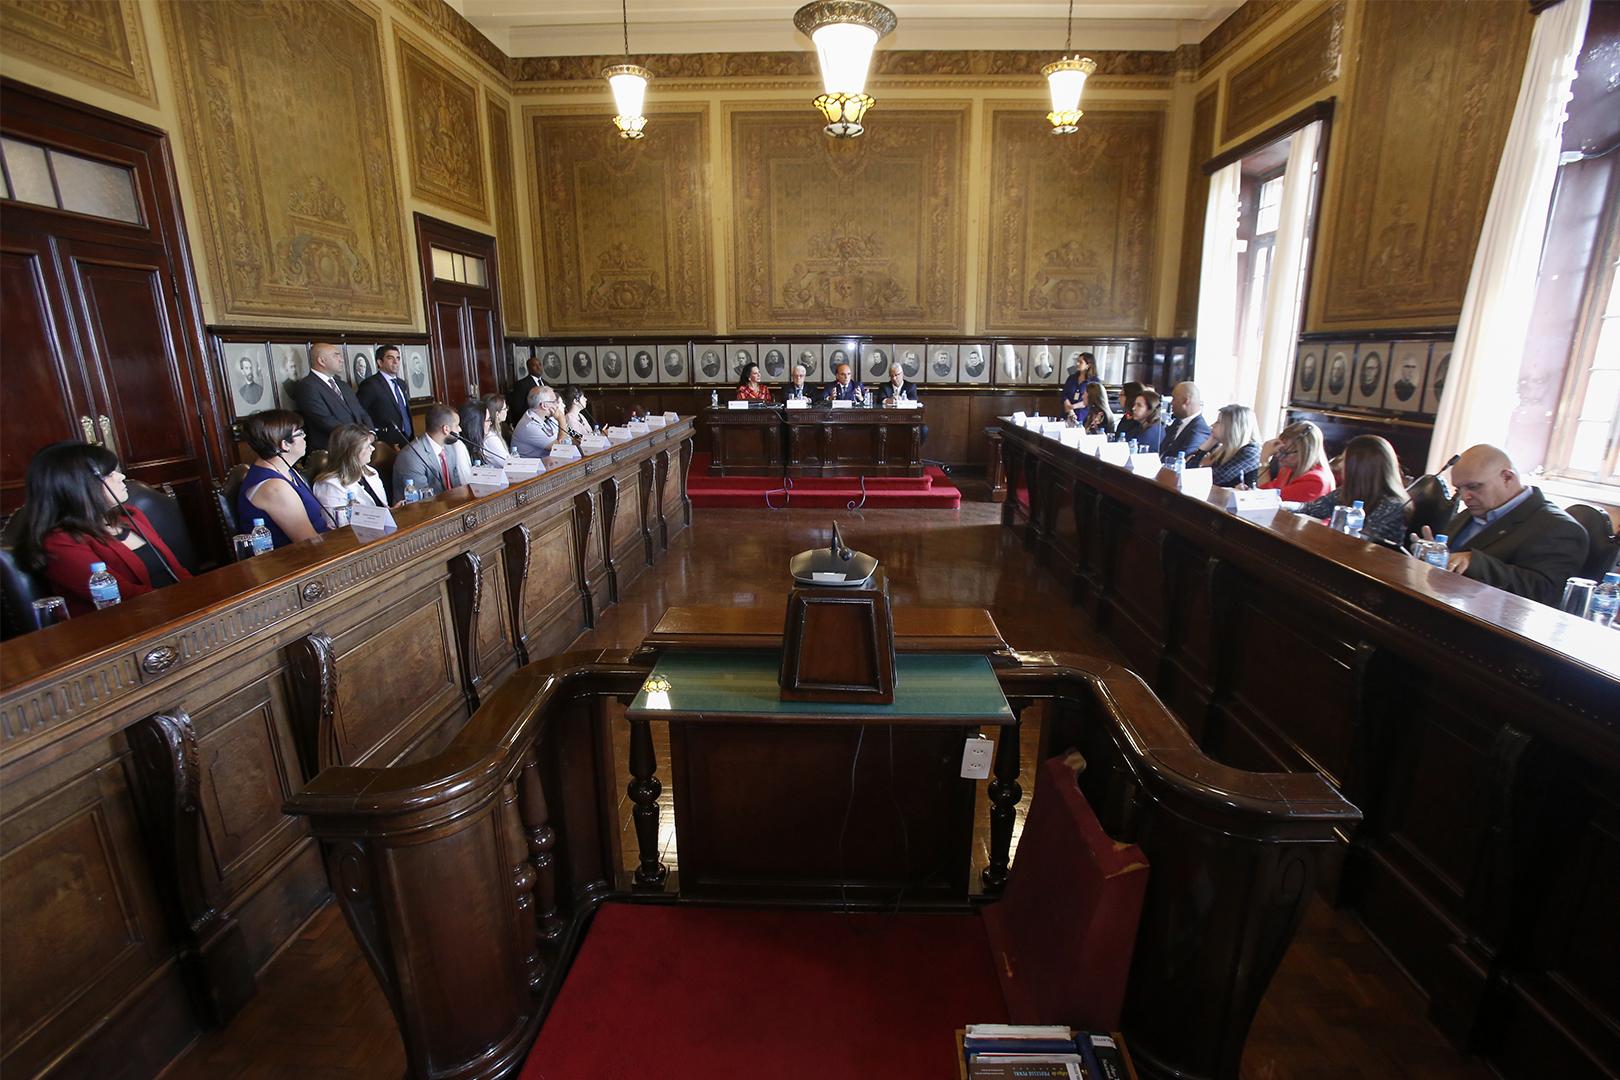 Tribunal realiza debate interinstitucional sobre abuso sexual nos transportes